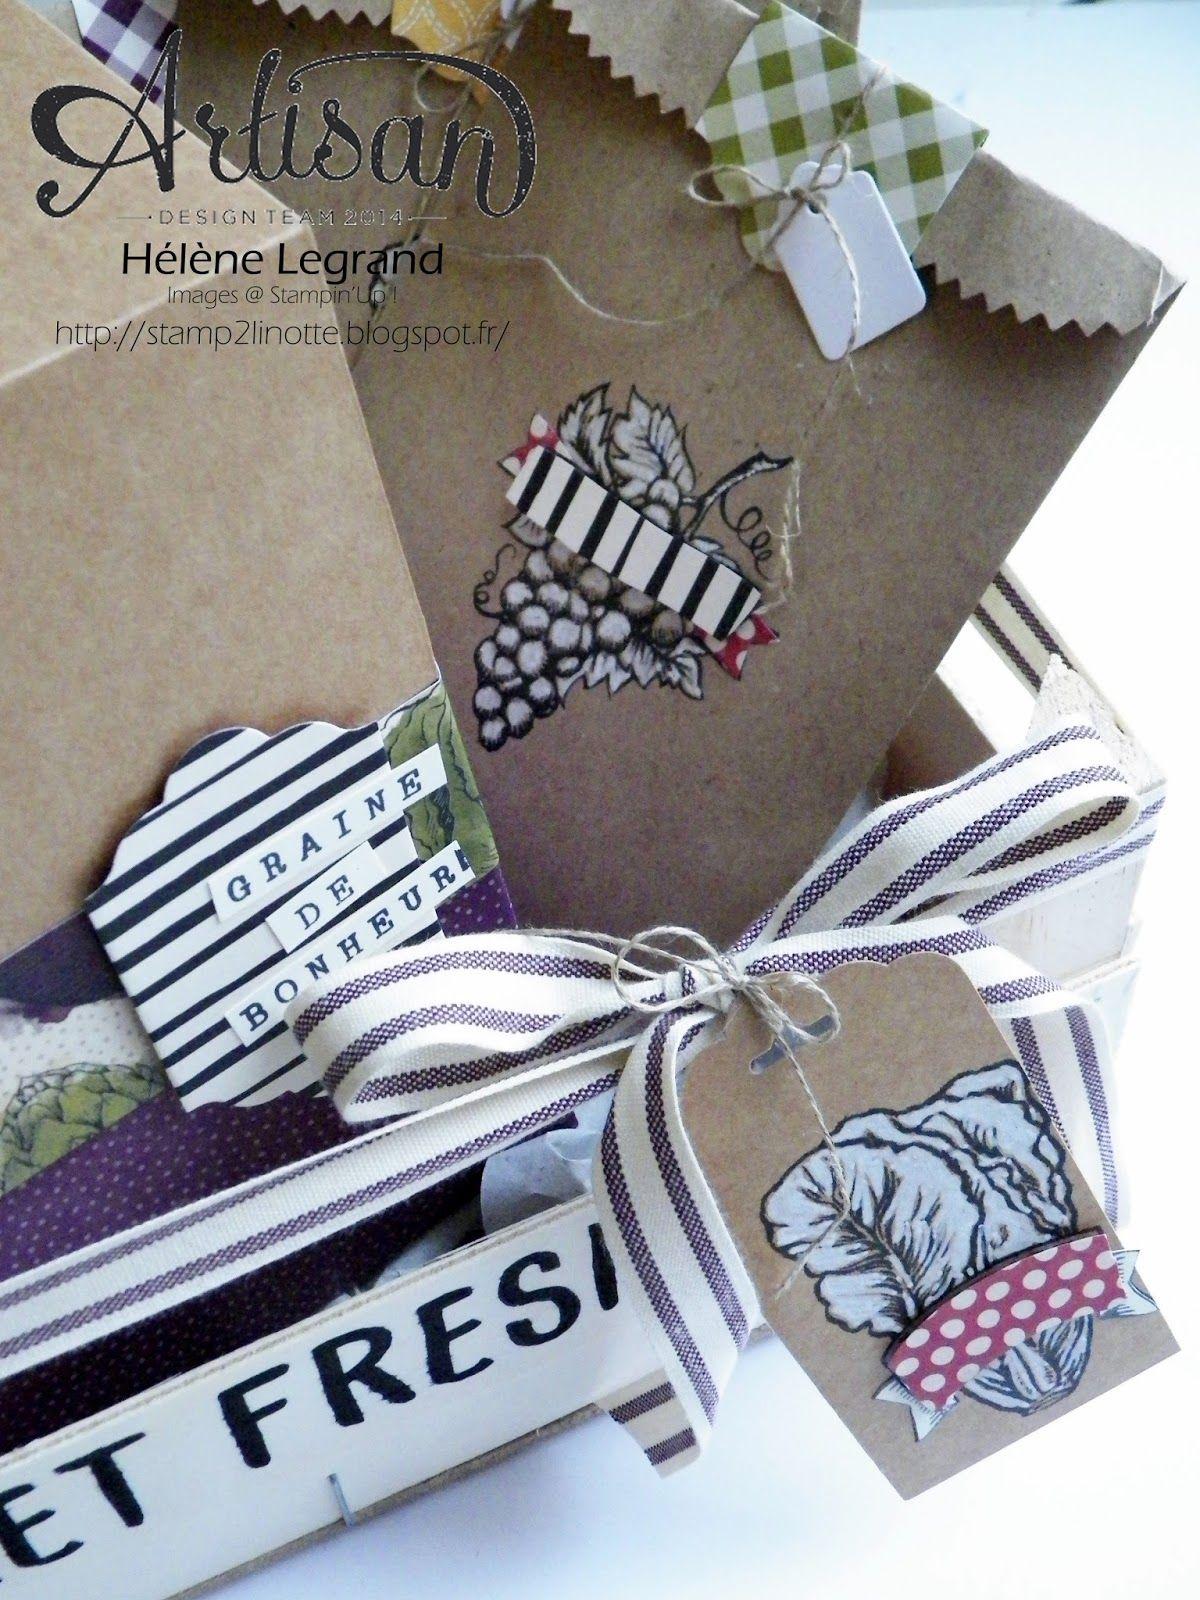 Market Fresh - Hélène LEGRAND - Stamp 2 LiNotte